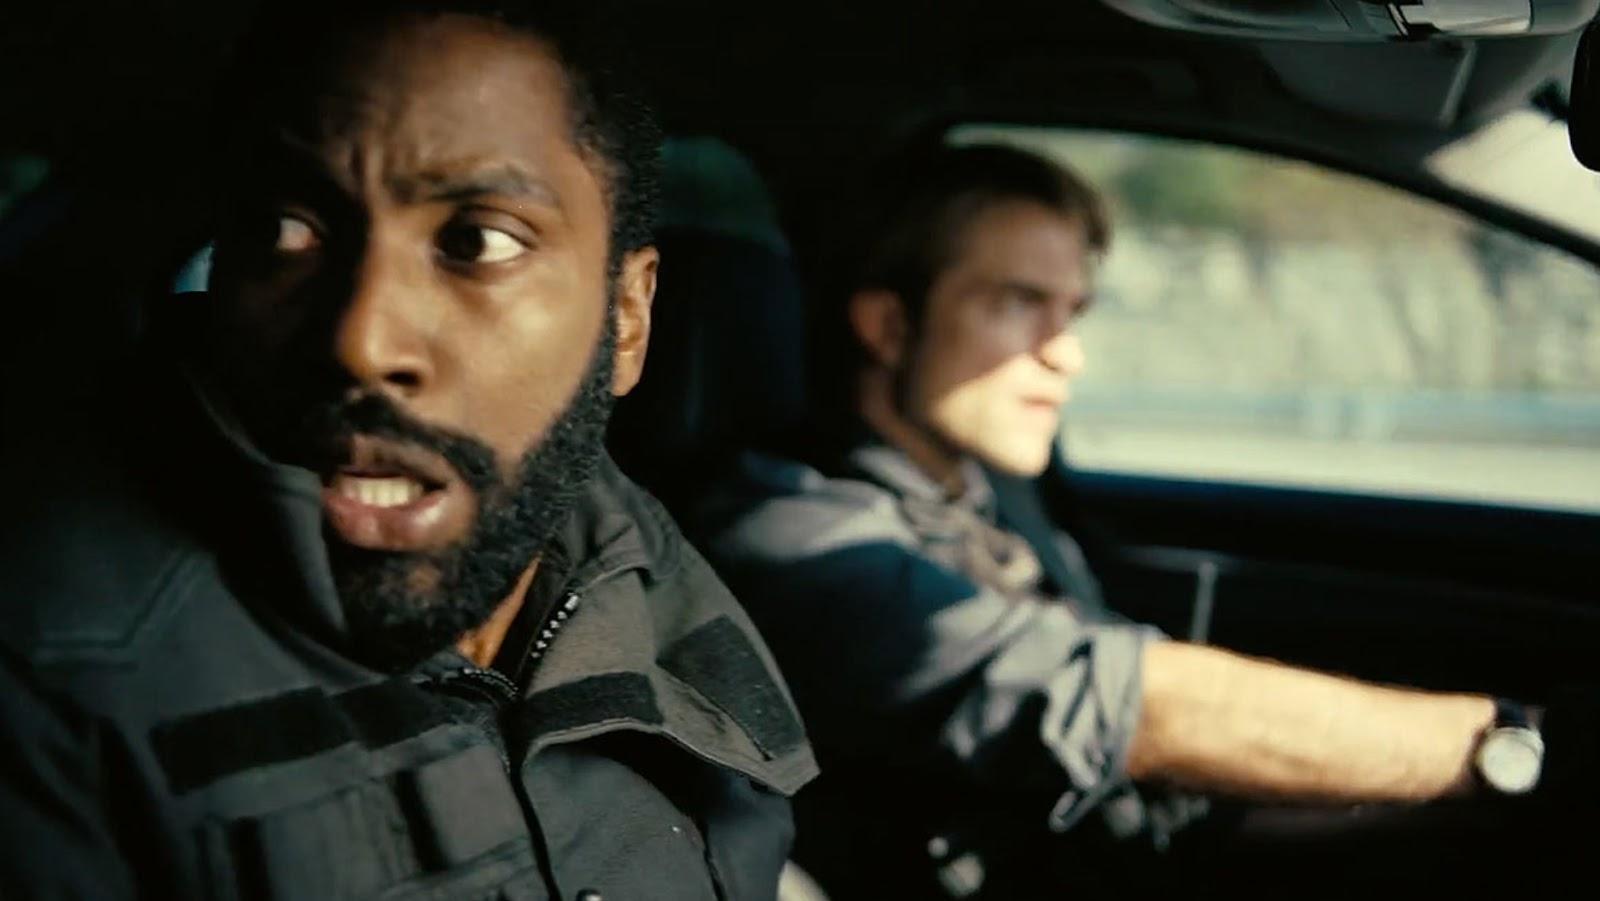 John David Washington and Robert Pattinson star in Tenet